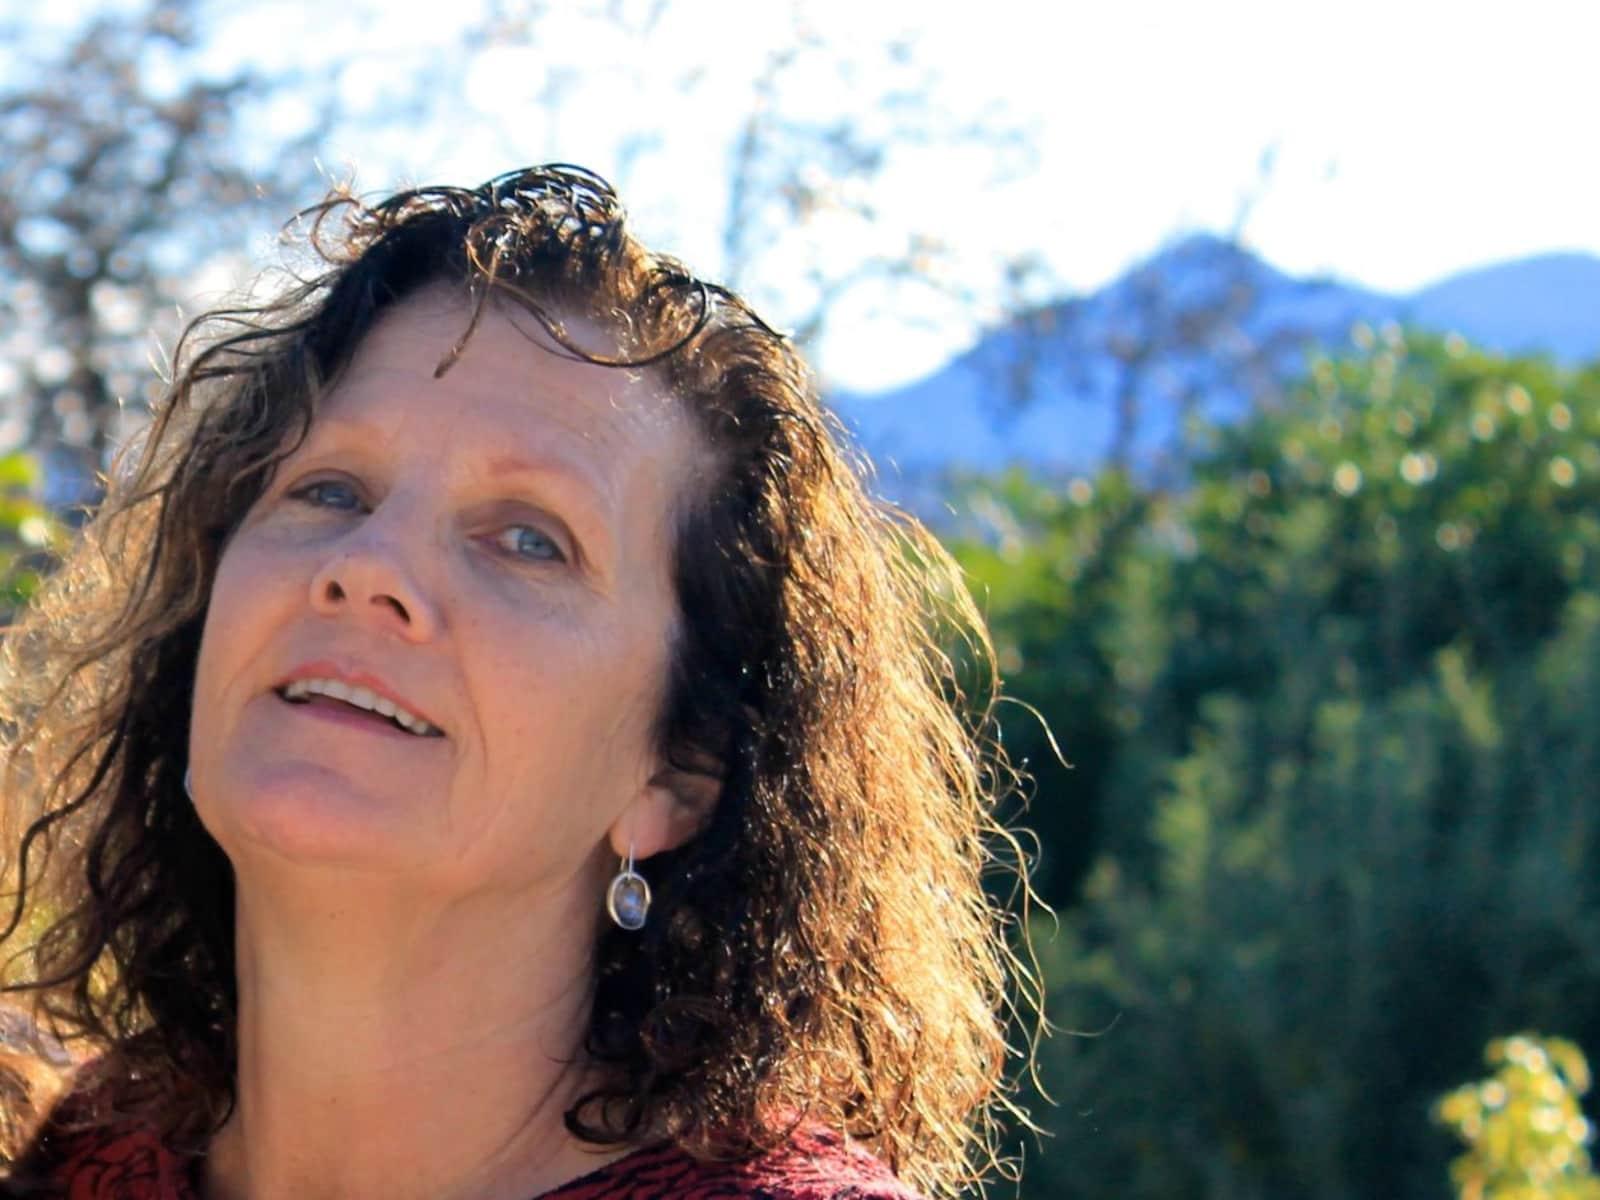 Lynette from Nelson, New Zealand